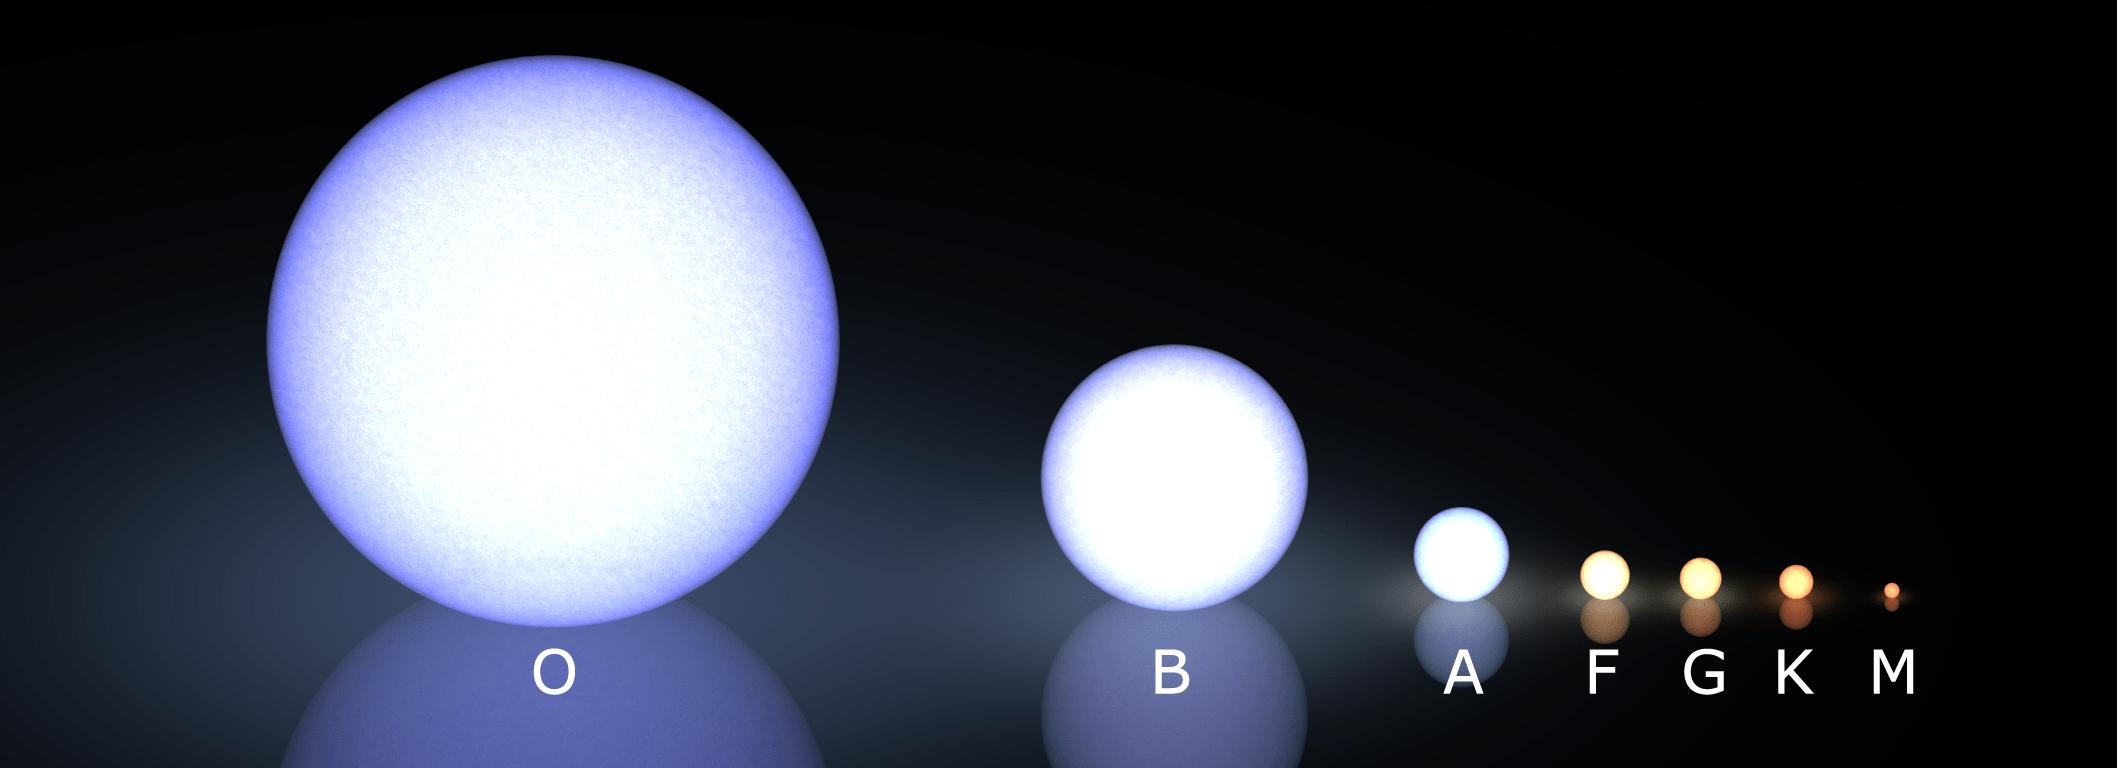 MK  Stellar Classification